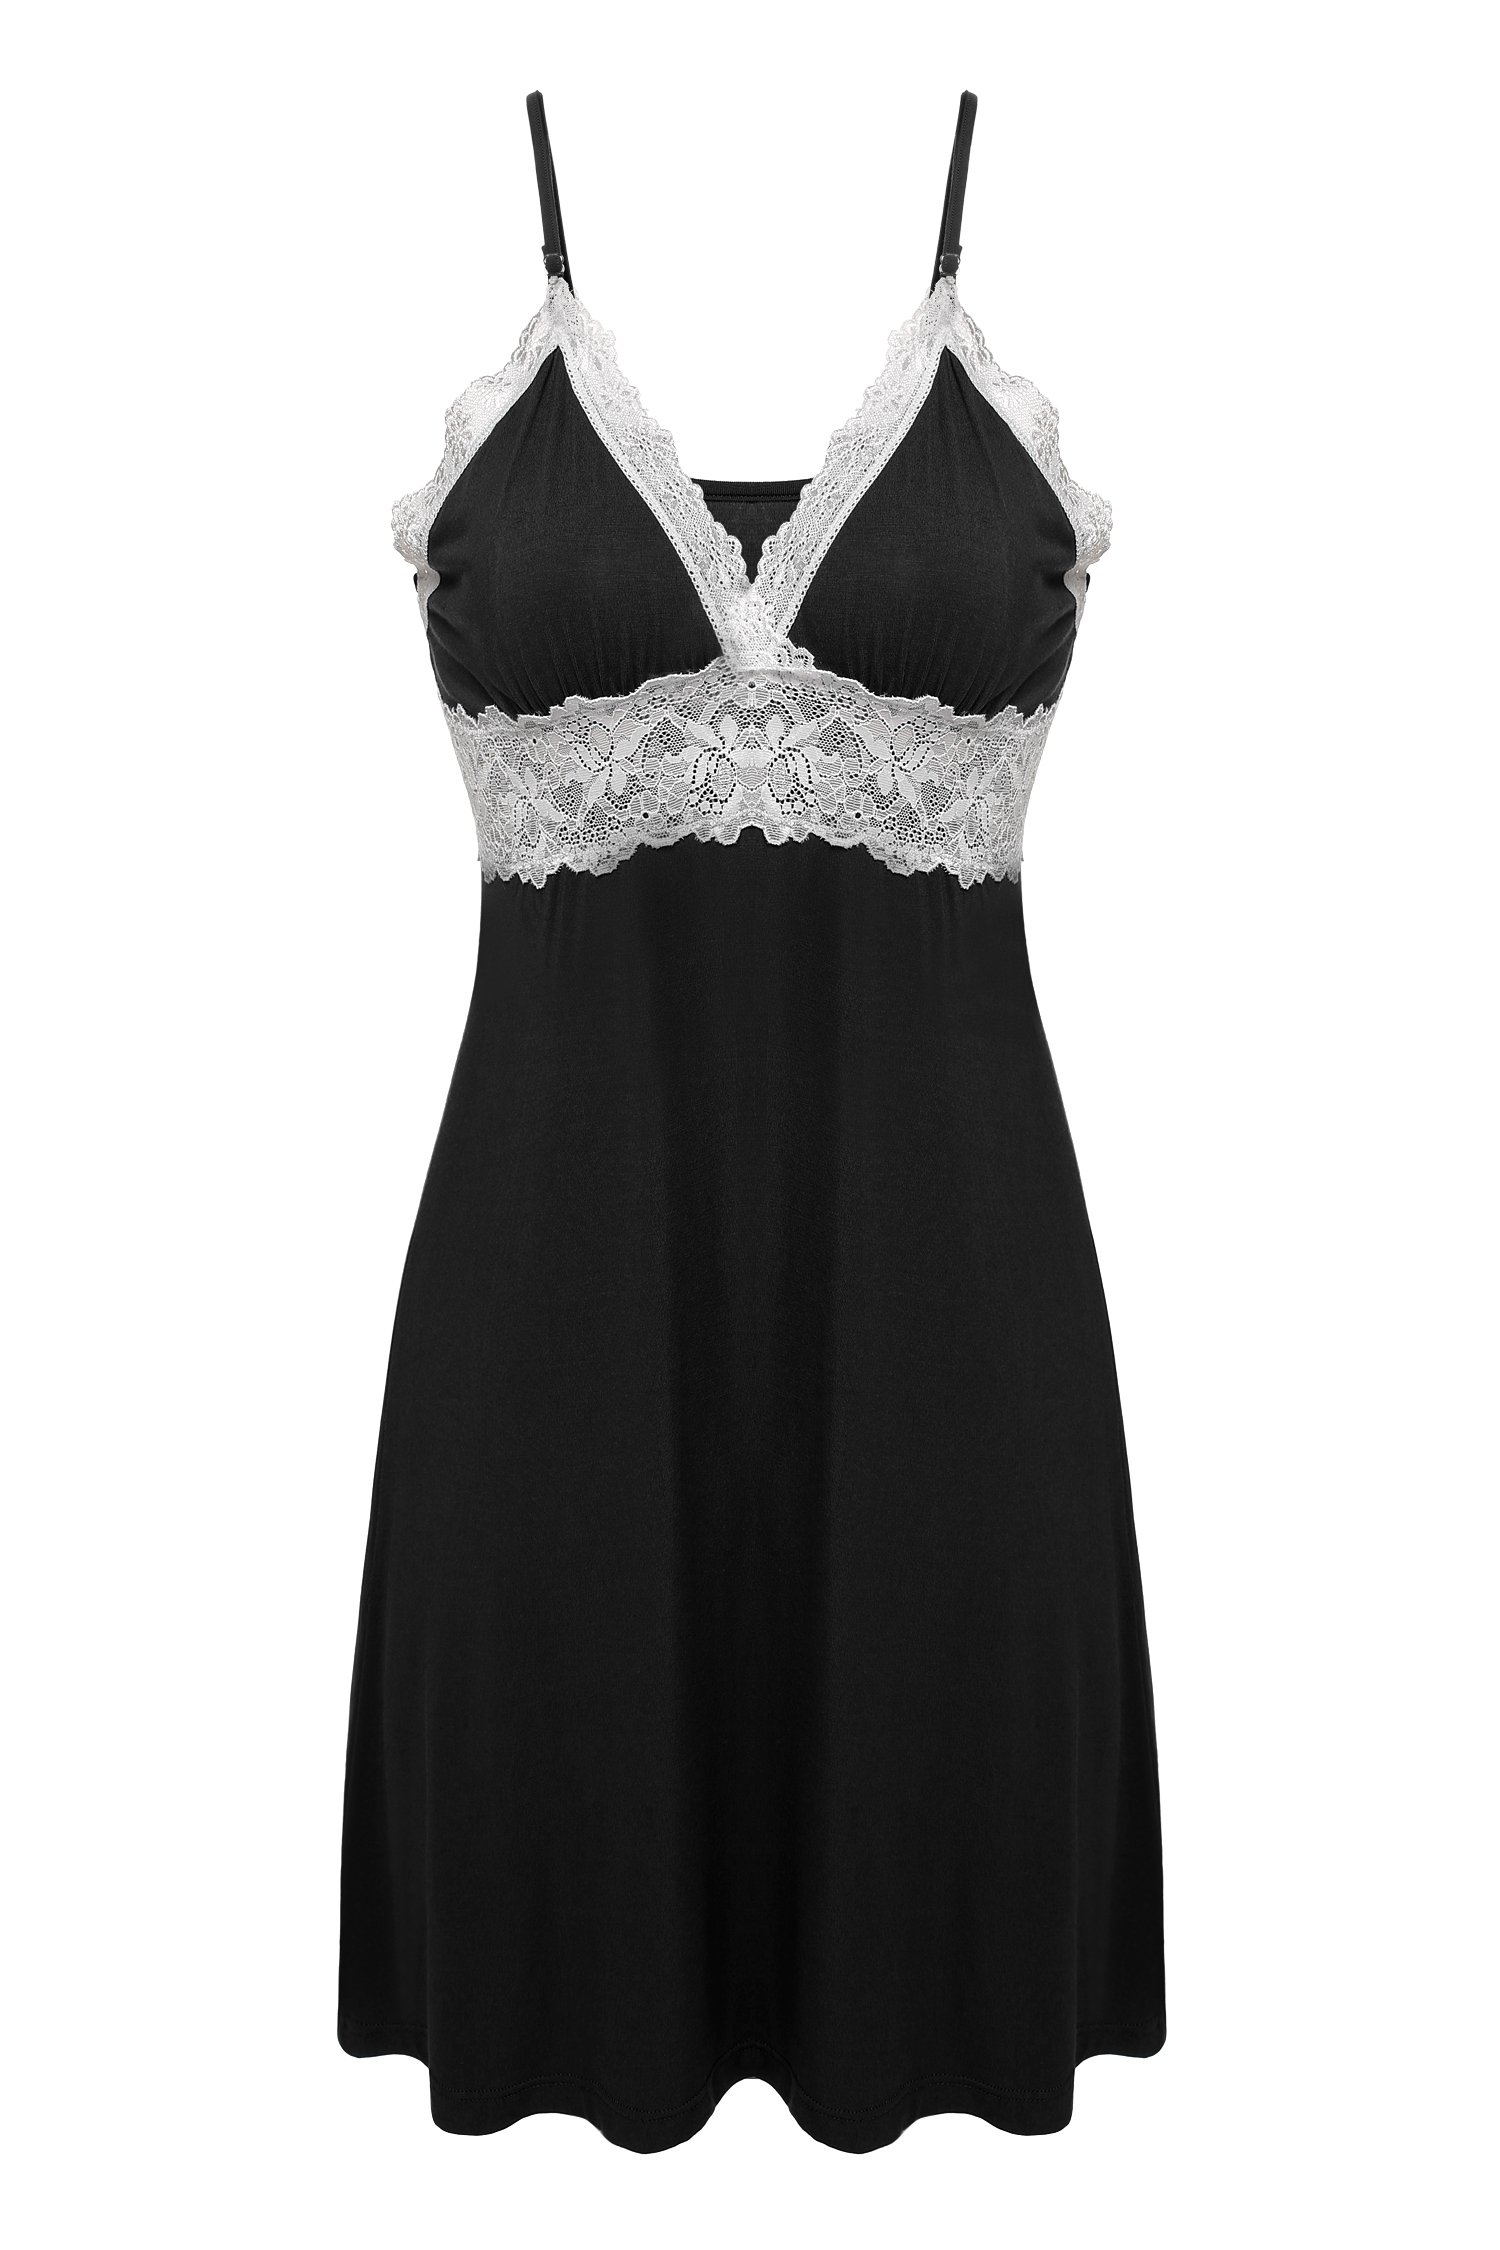 5bbe5c93424 Ekouaer Sleepwear Womens Chemise Nightgown Full Slip Lace Lounge Dress